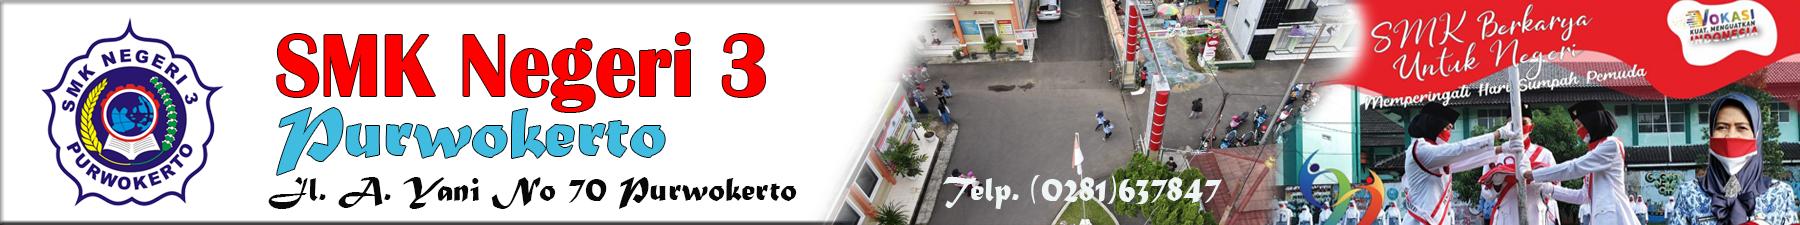 SMK Negeri 3 Purwokerto